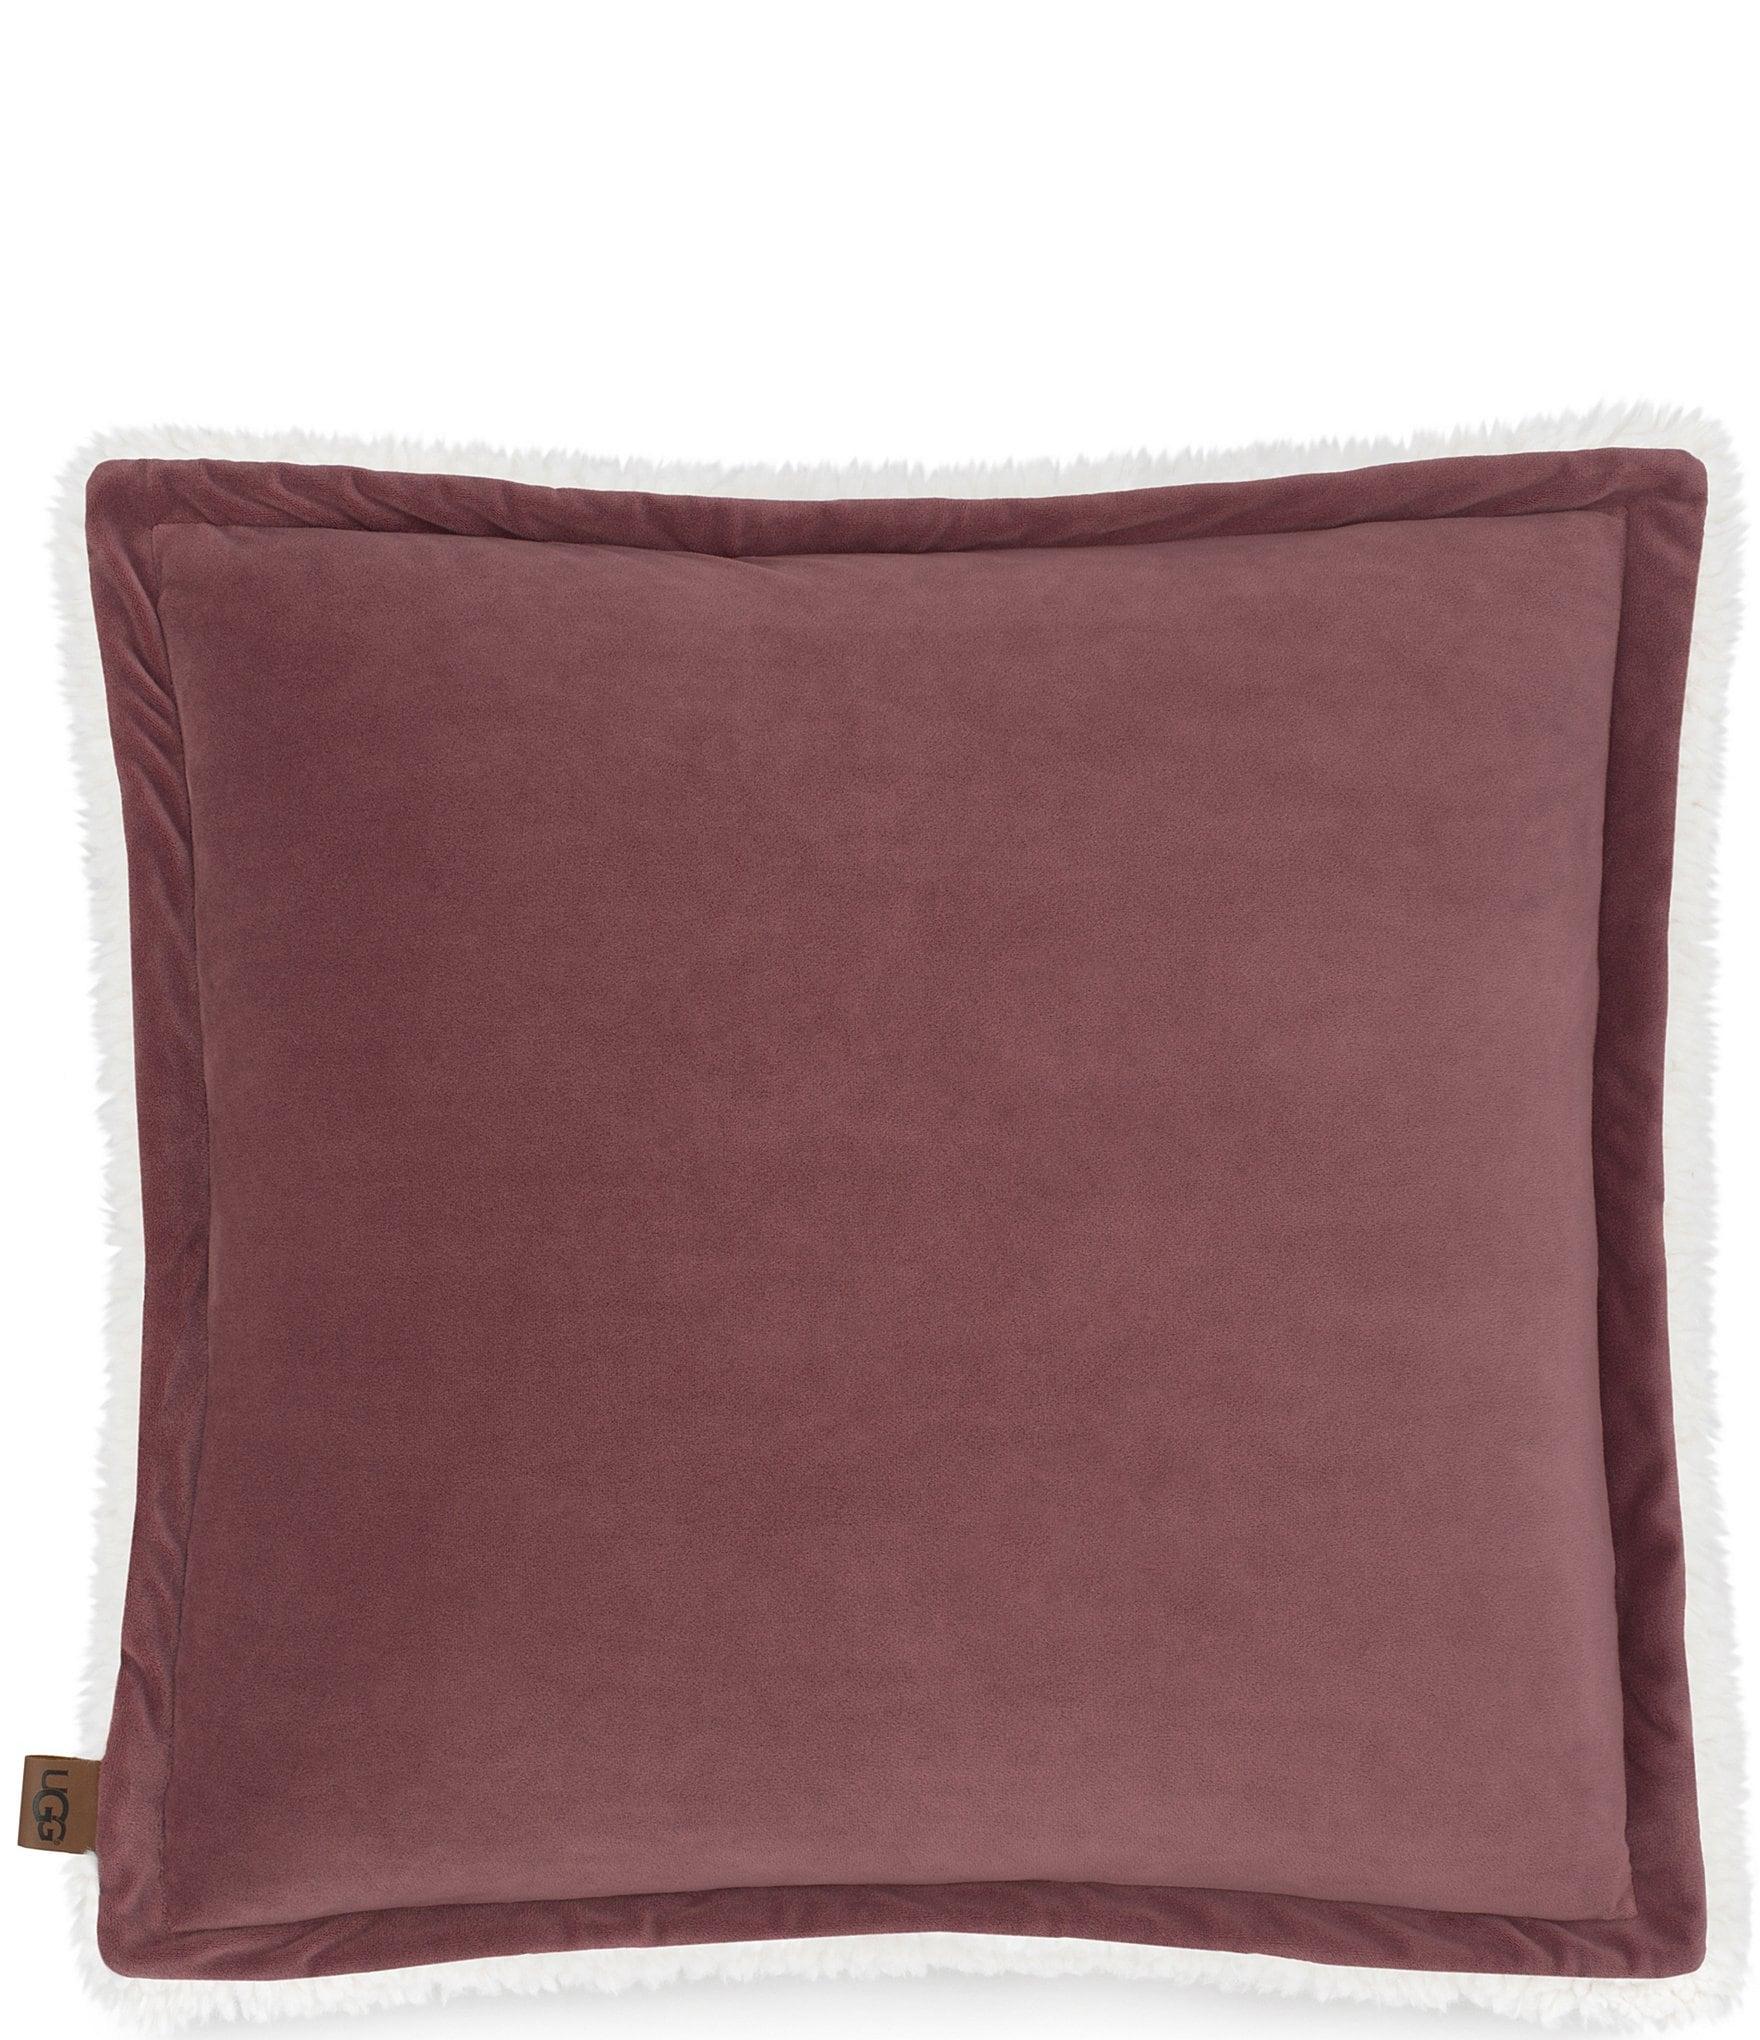 06eb4602fb7 Red Decorative Pillows